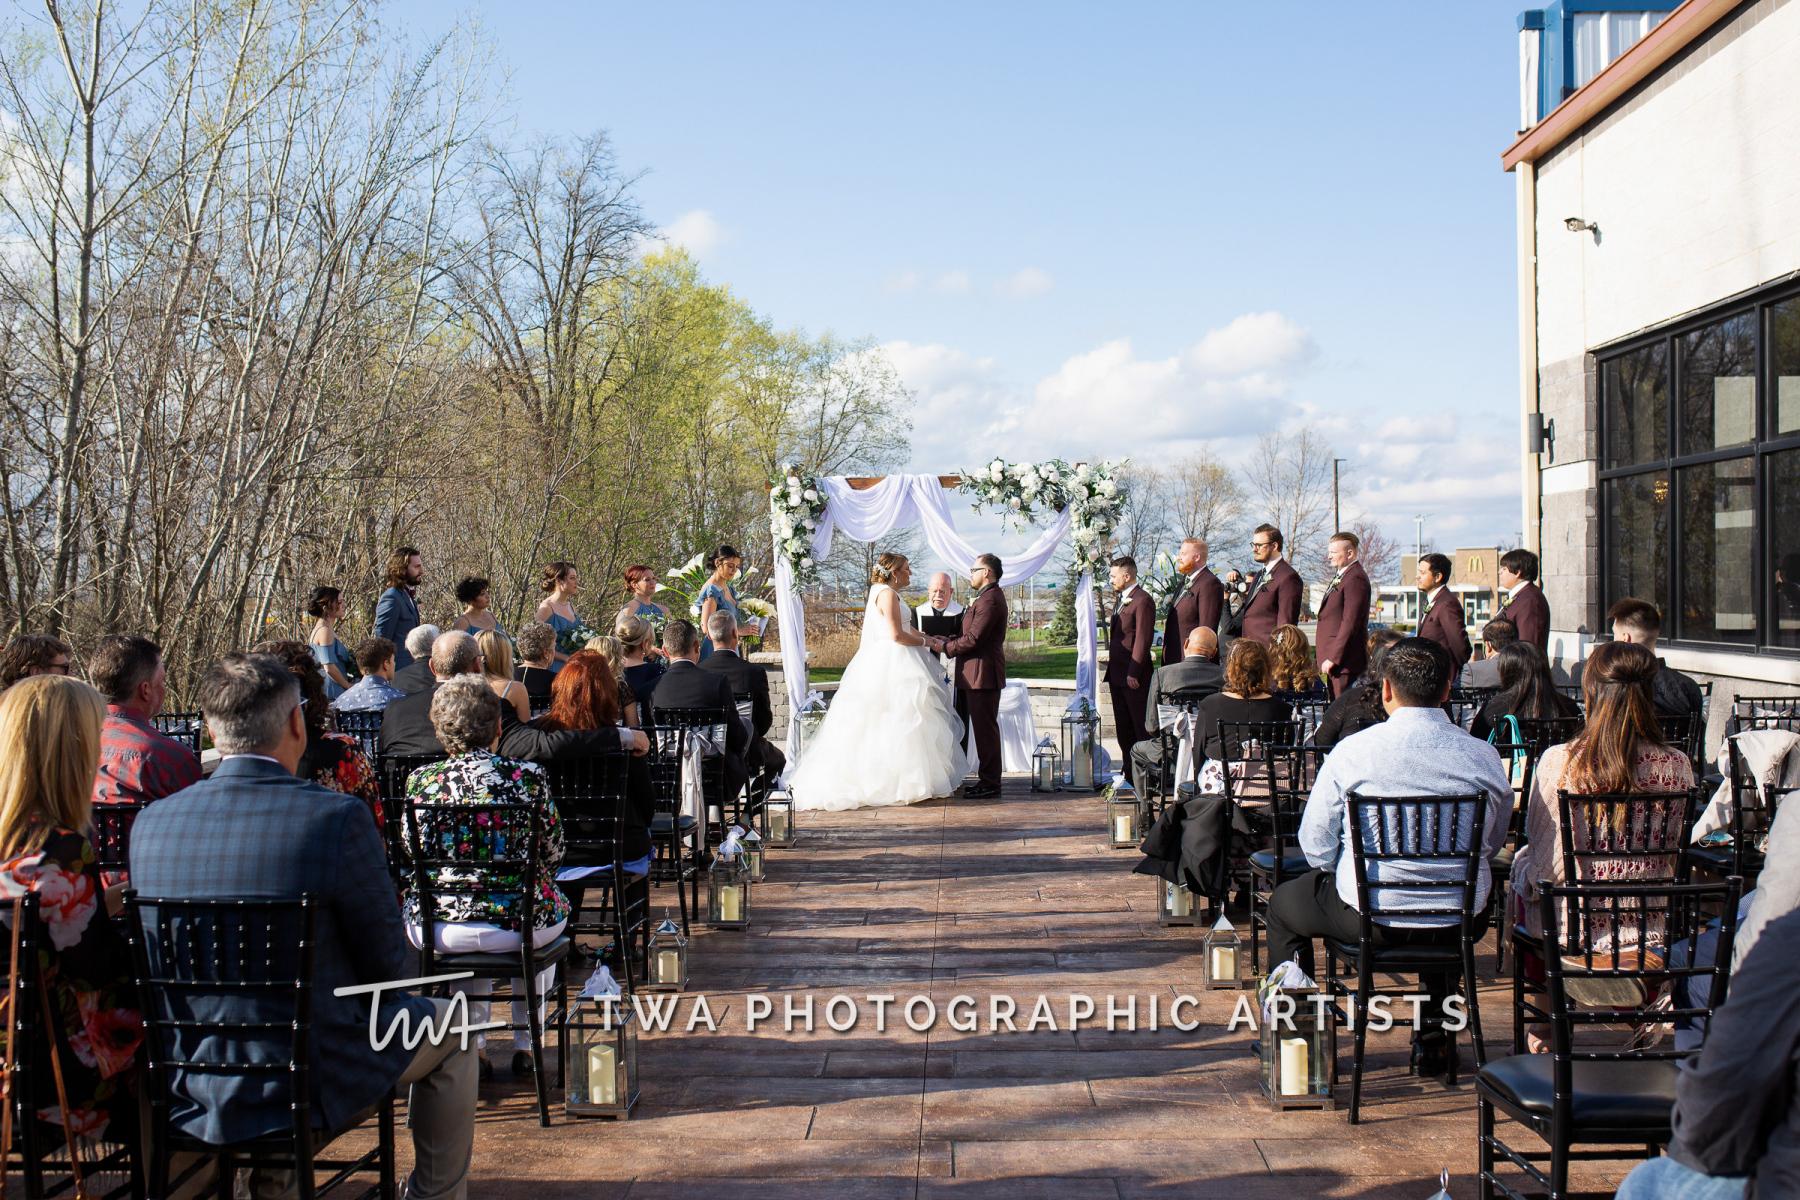 Chicago-Wedding-Photographers-Martini-Banquets_Borys_Caballero_MJ_SG-047-0284